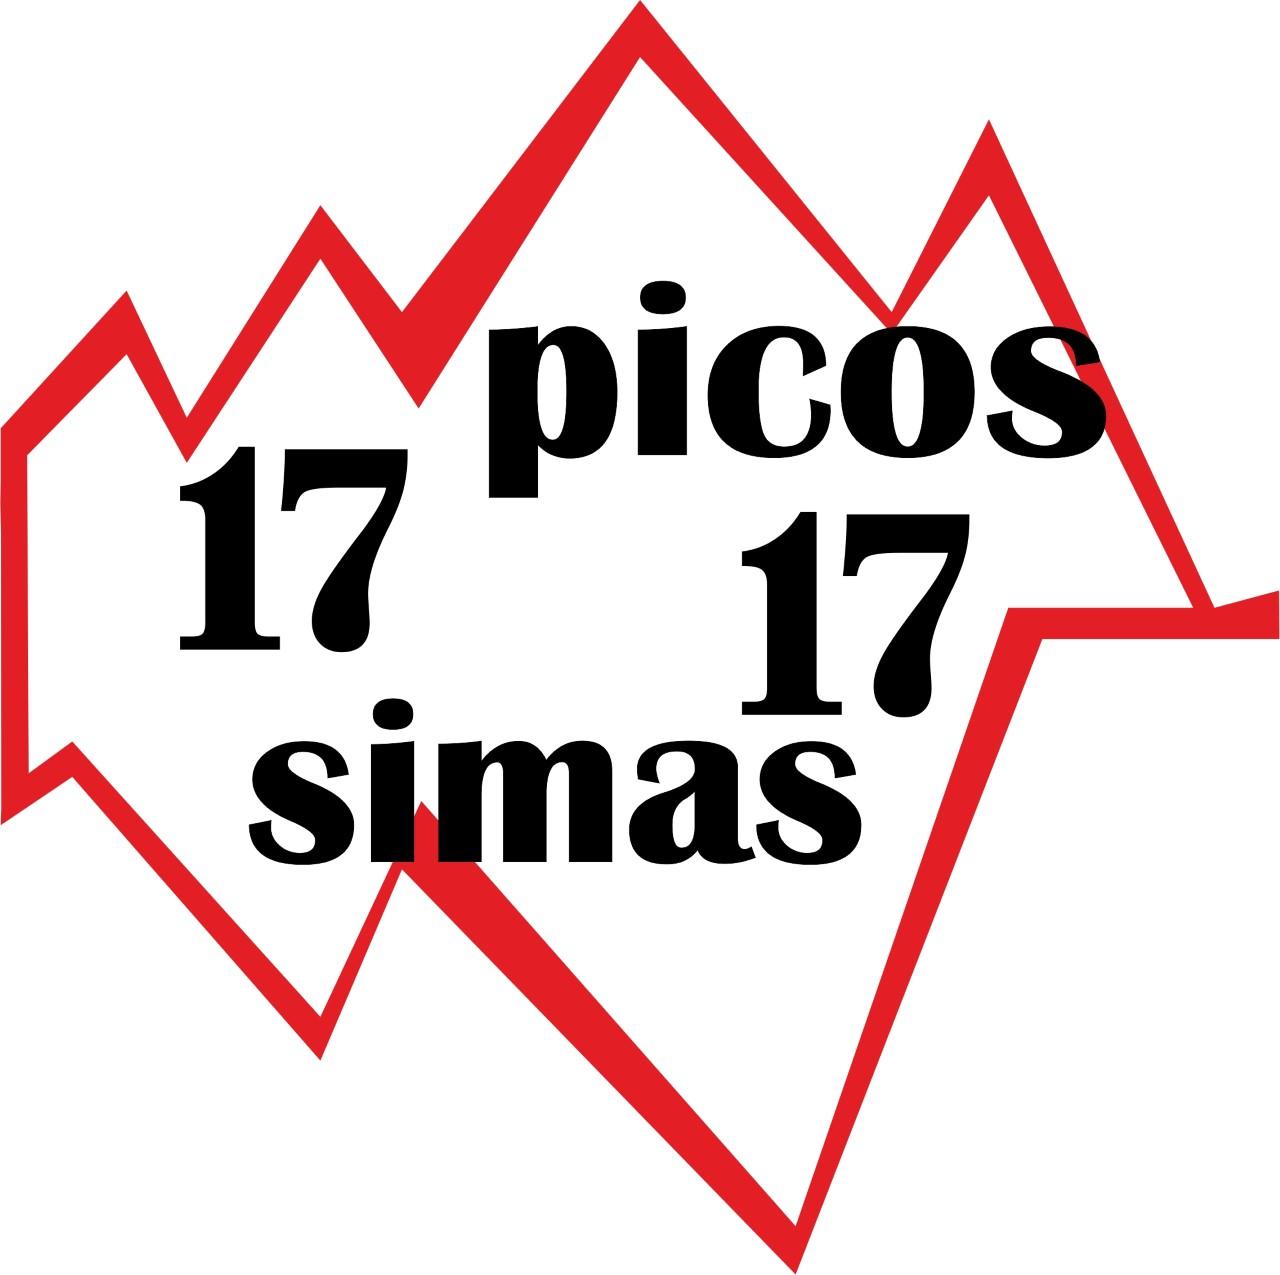 17 P 17 S